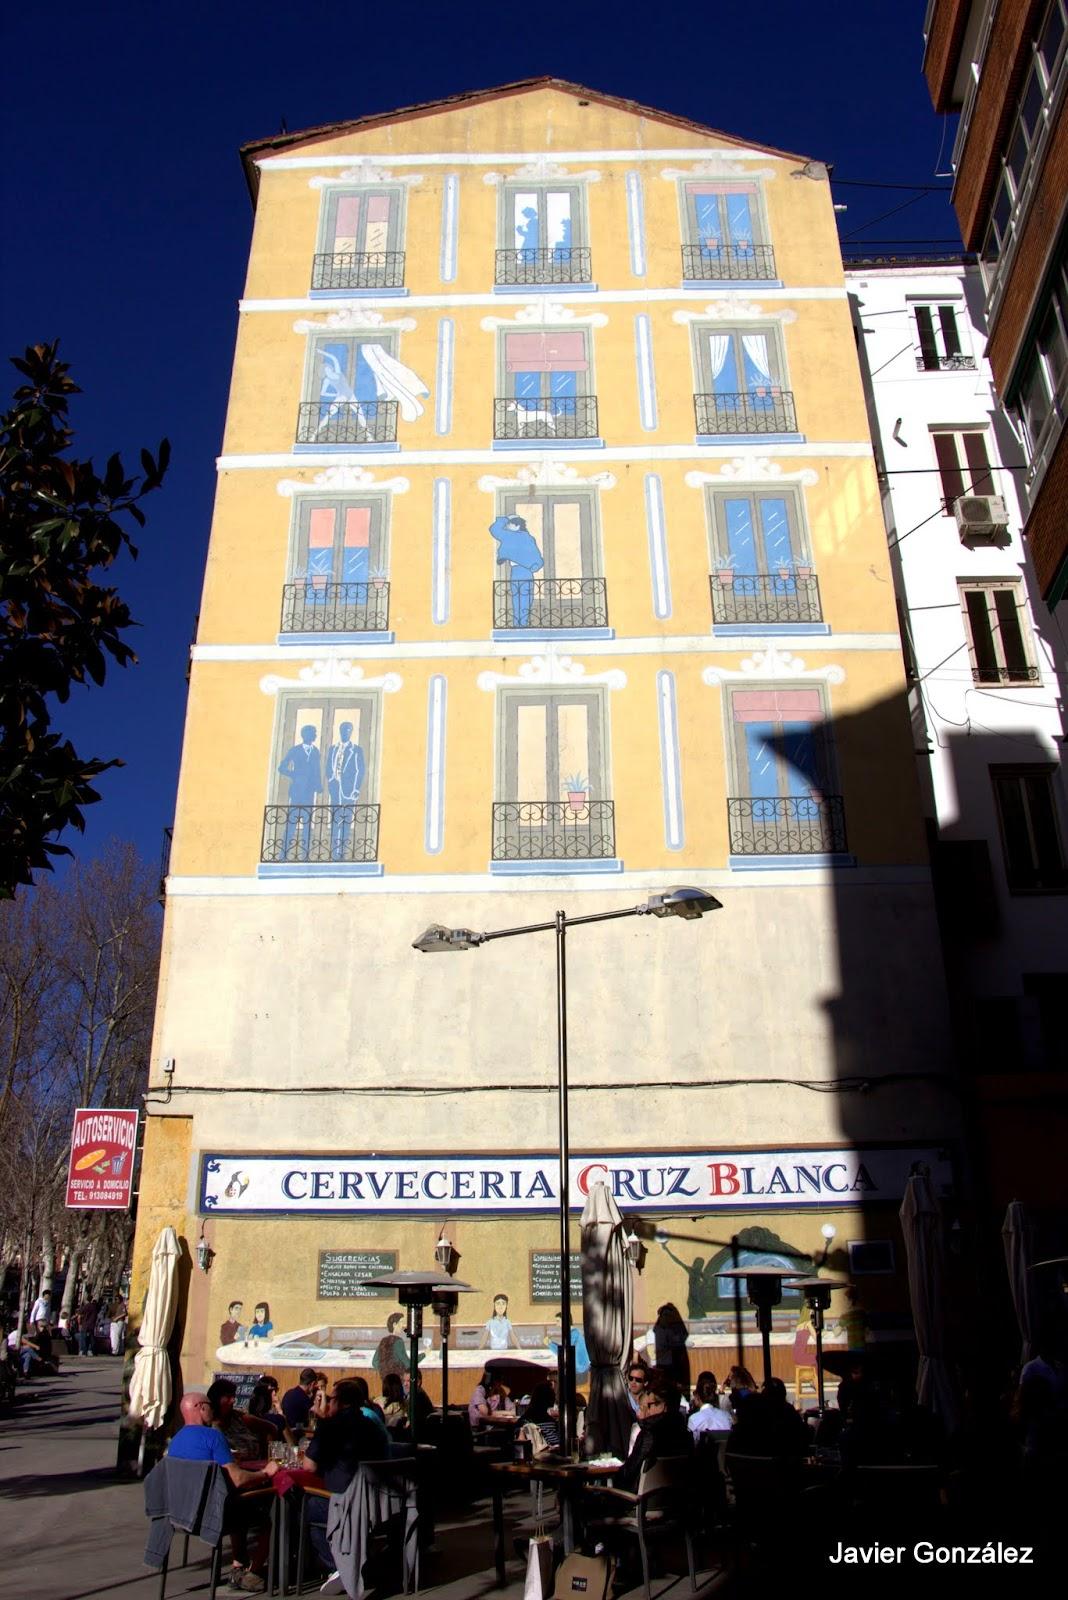 Trampantojo. Mural. Calle Hortaleza. Casa simulada. Cervecería Cruz Blanca